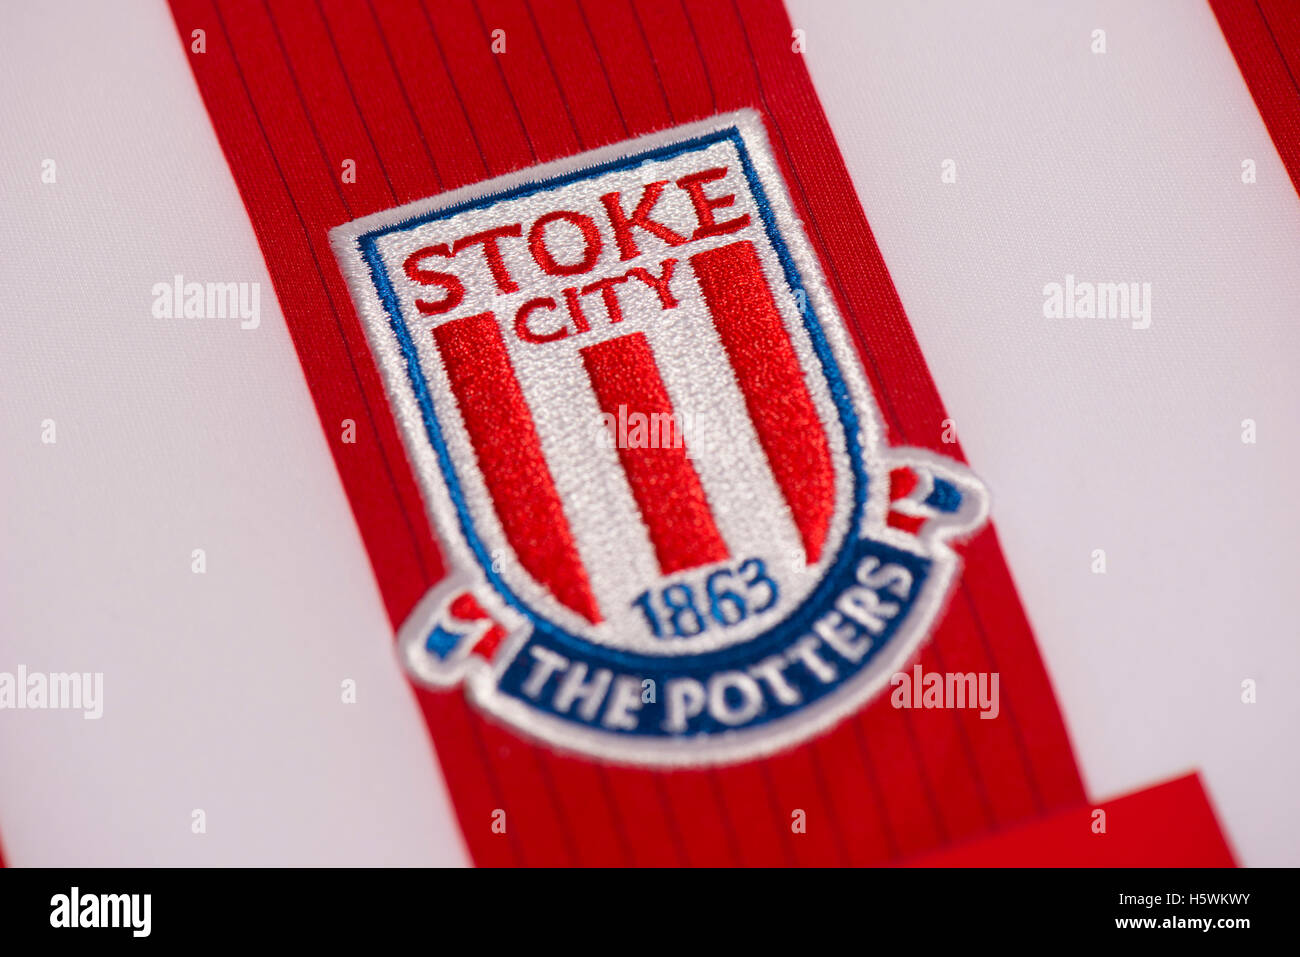 Premier League Stoke City football club badge Stock Photo